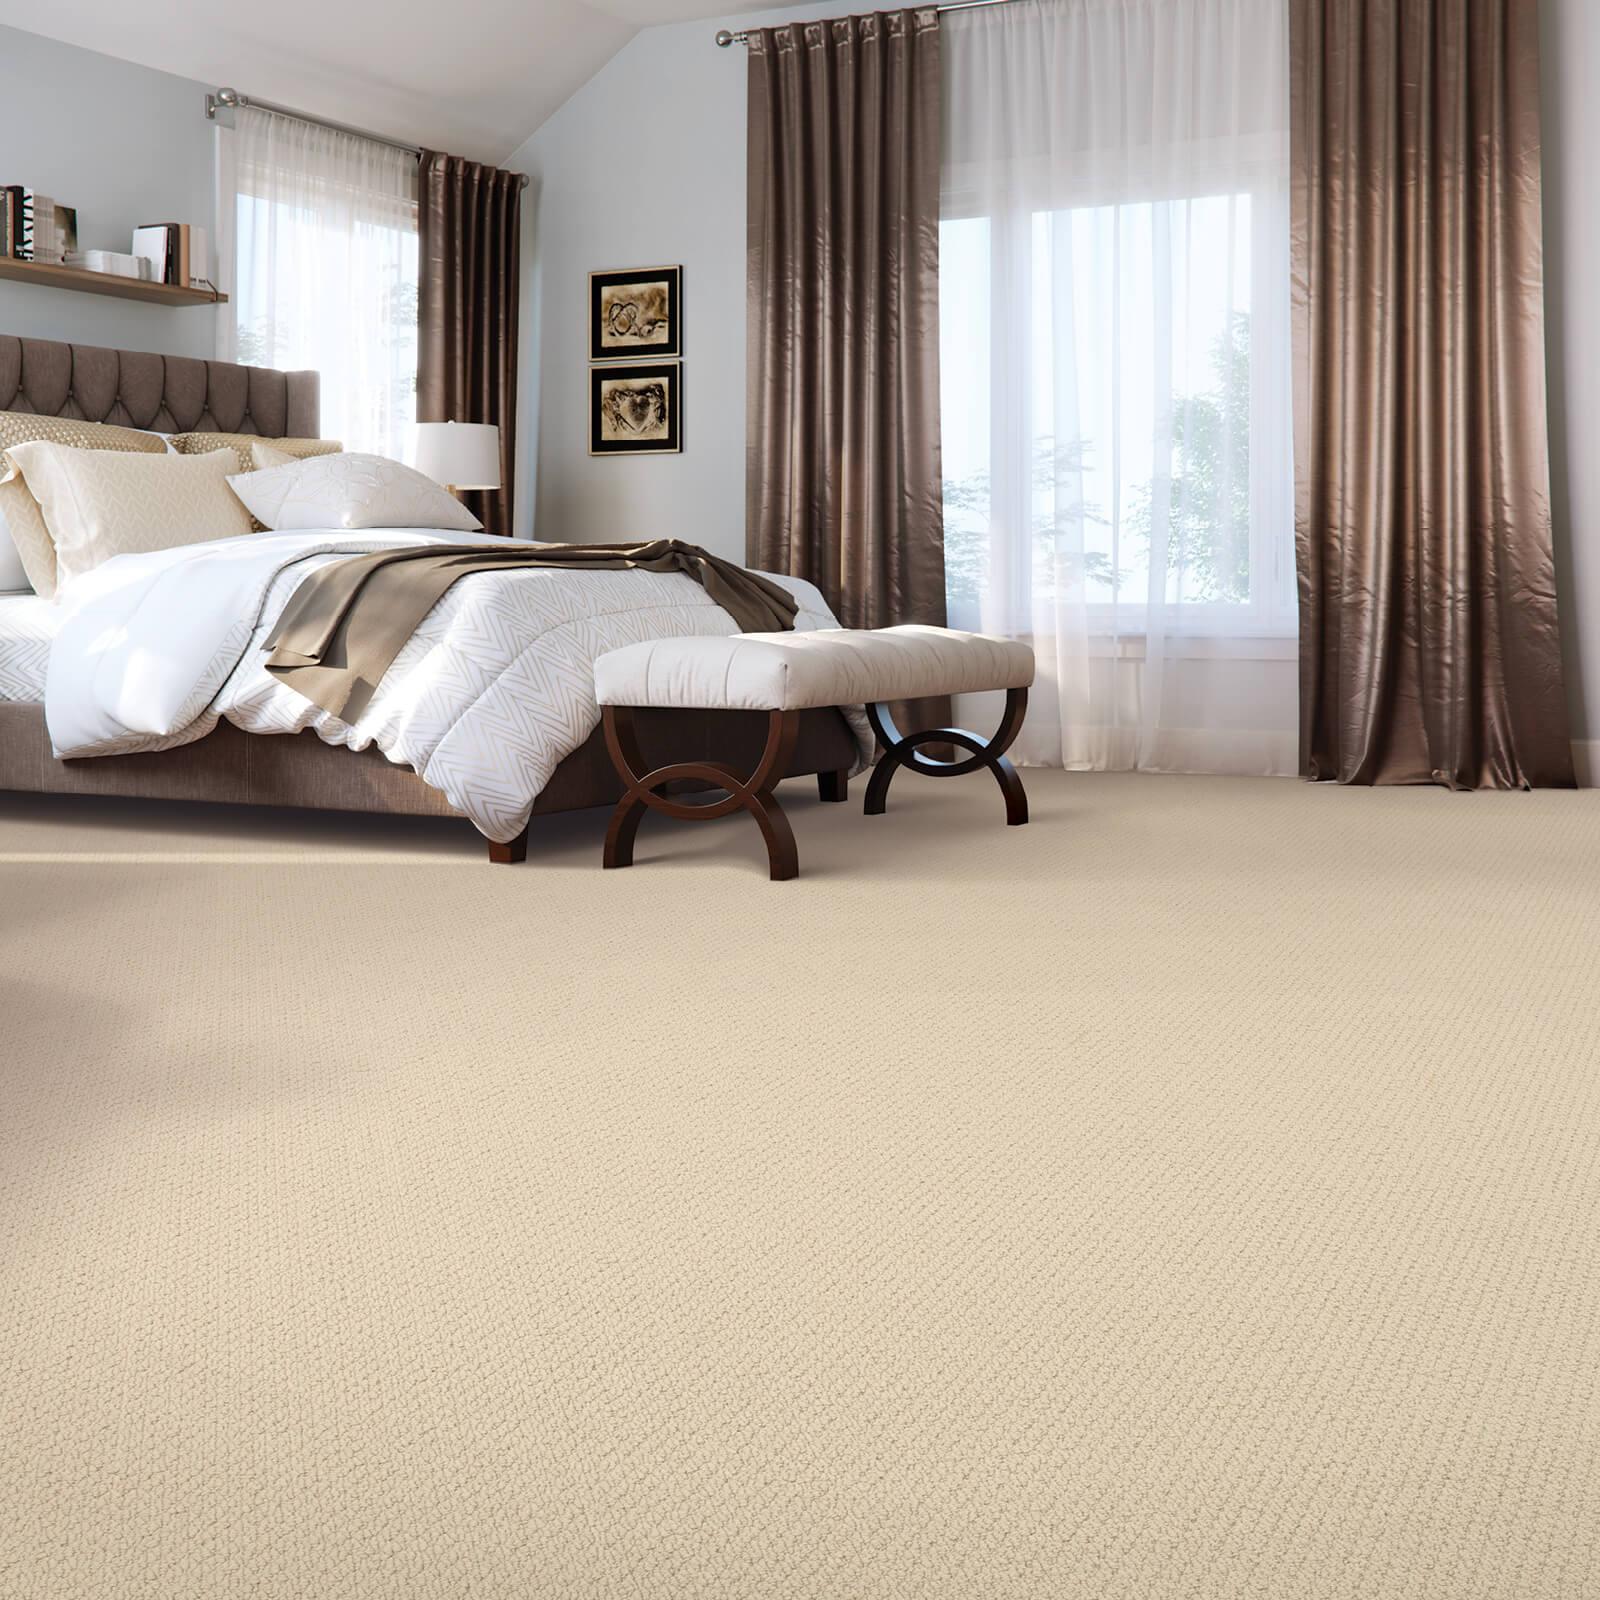 Casual beauty of spacious bedroom | McSwain Carpet & Floors